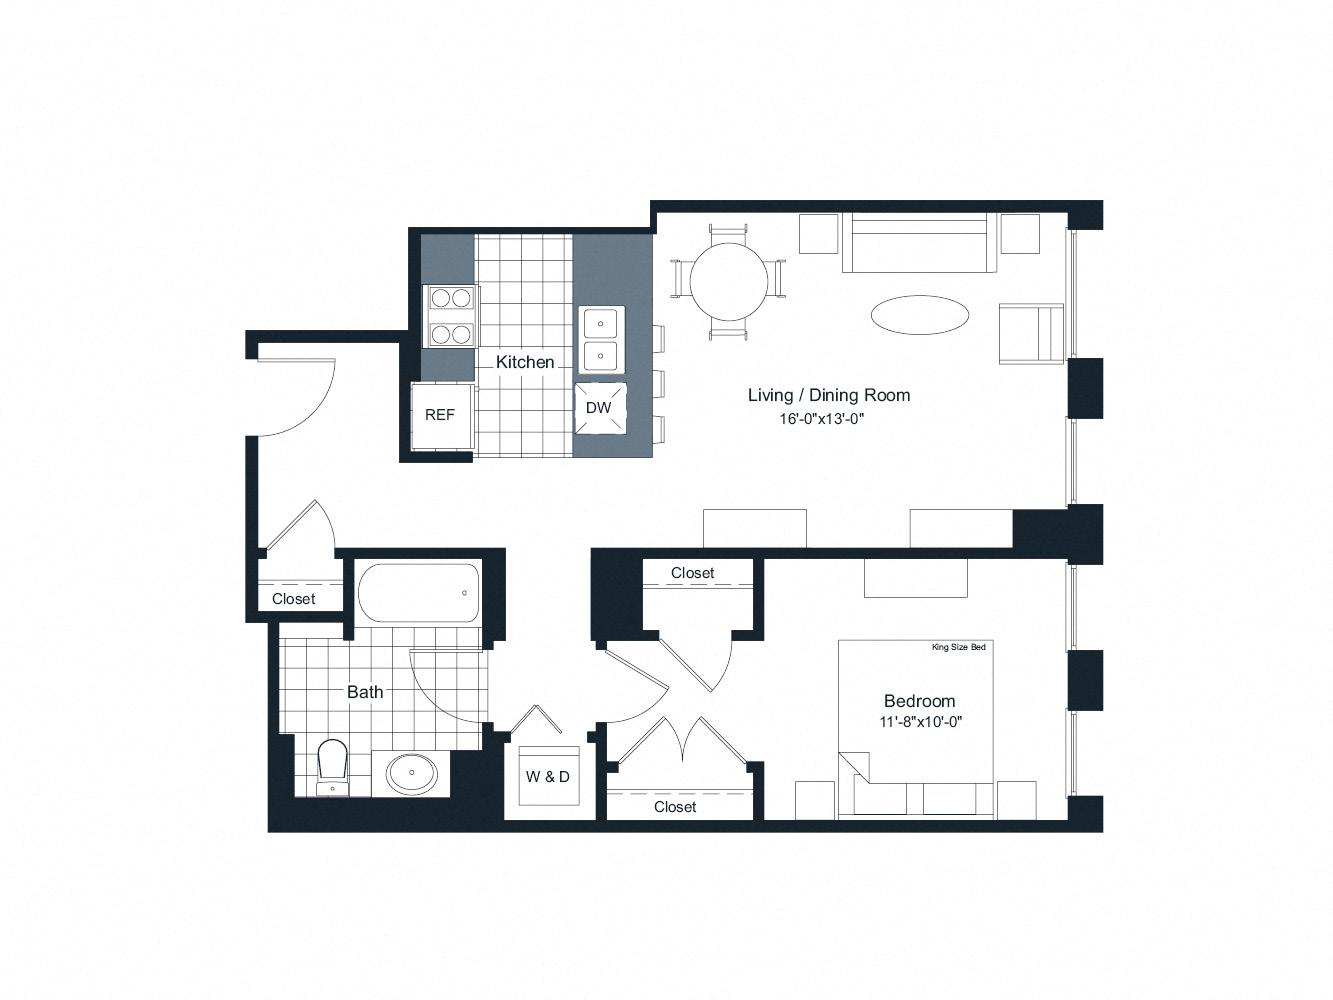 Floorplan 08